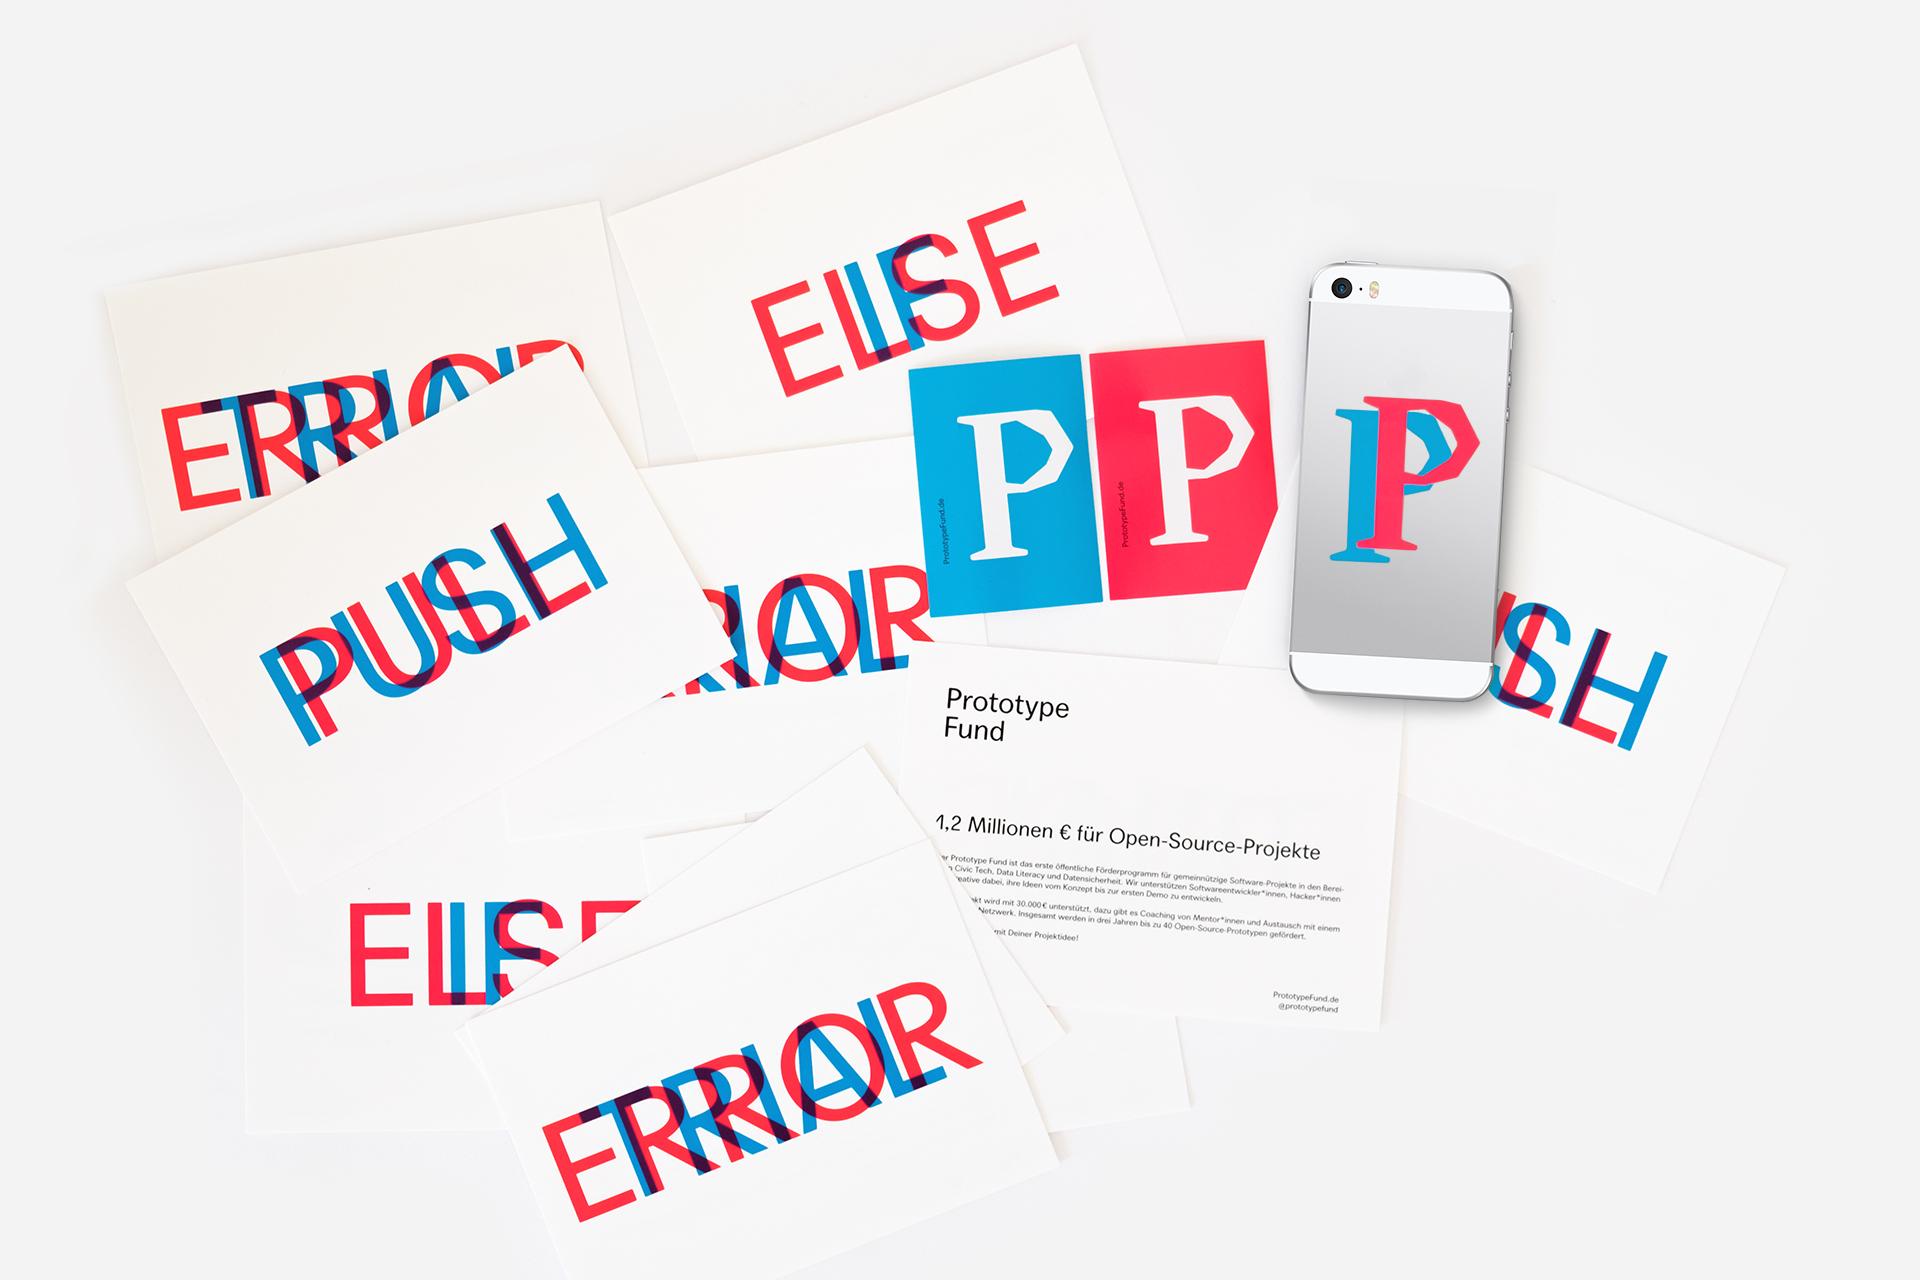 Prototypefund_branding